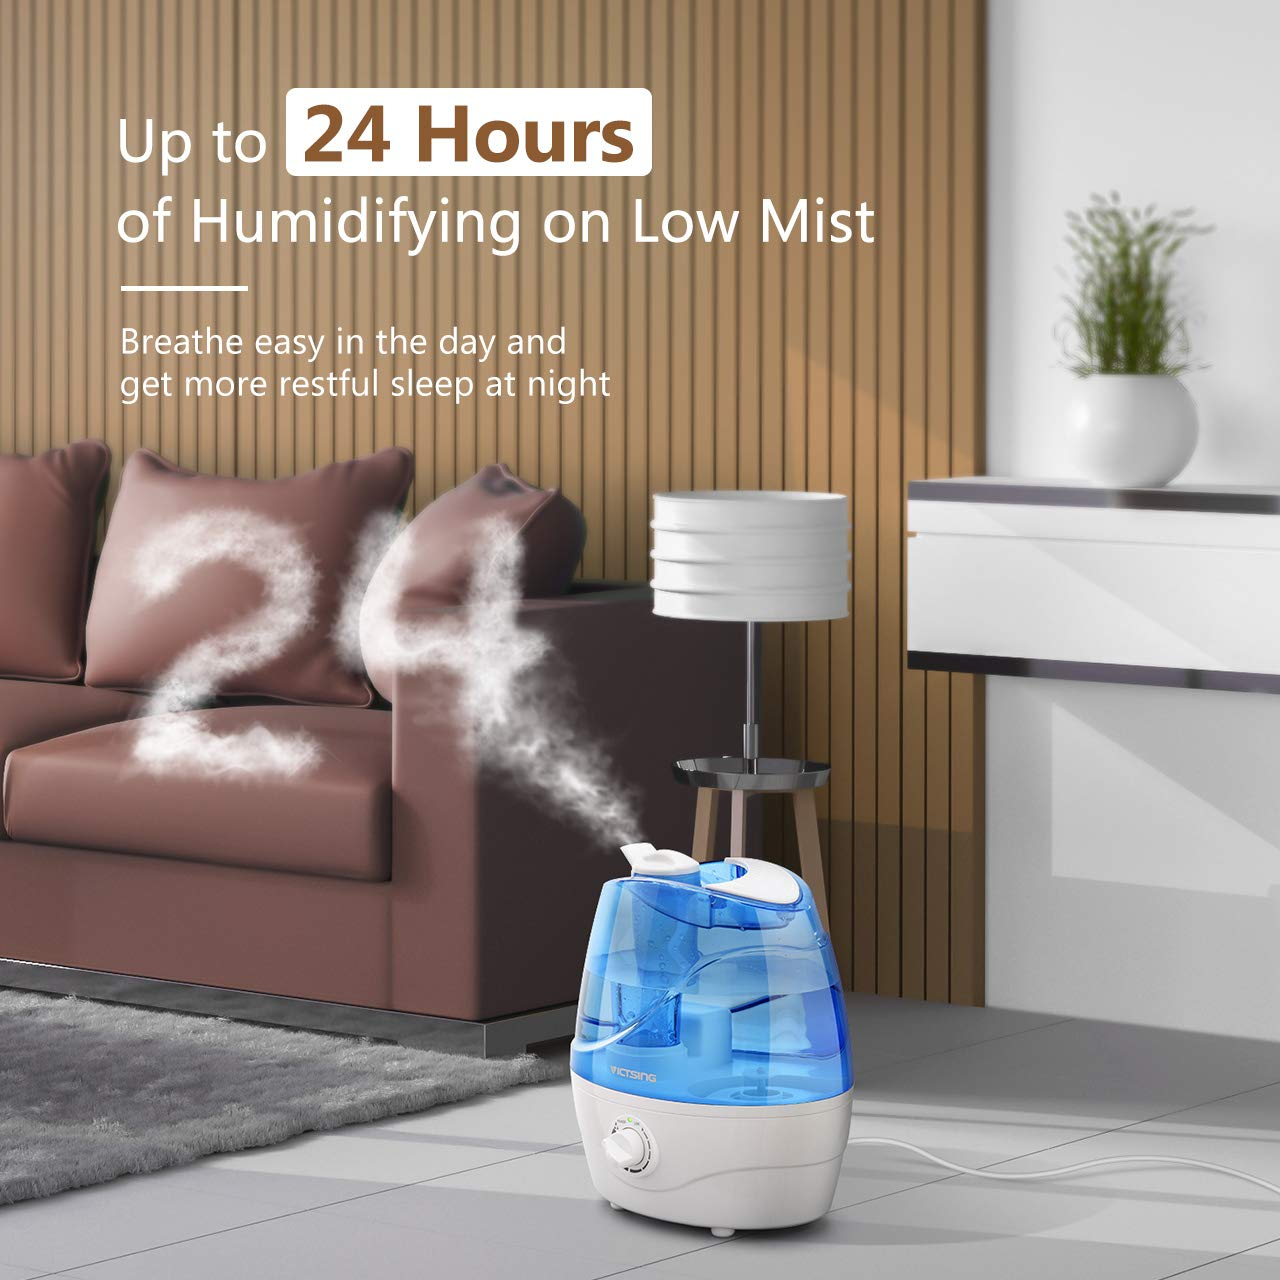 VicTsing Luftbefeuchter, Ultraschall-Luftbefeuchter